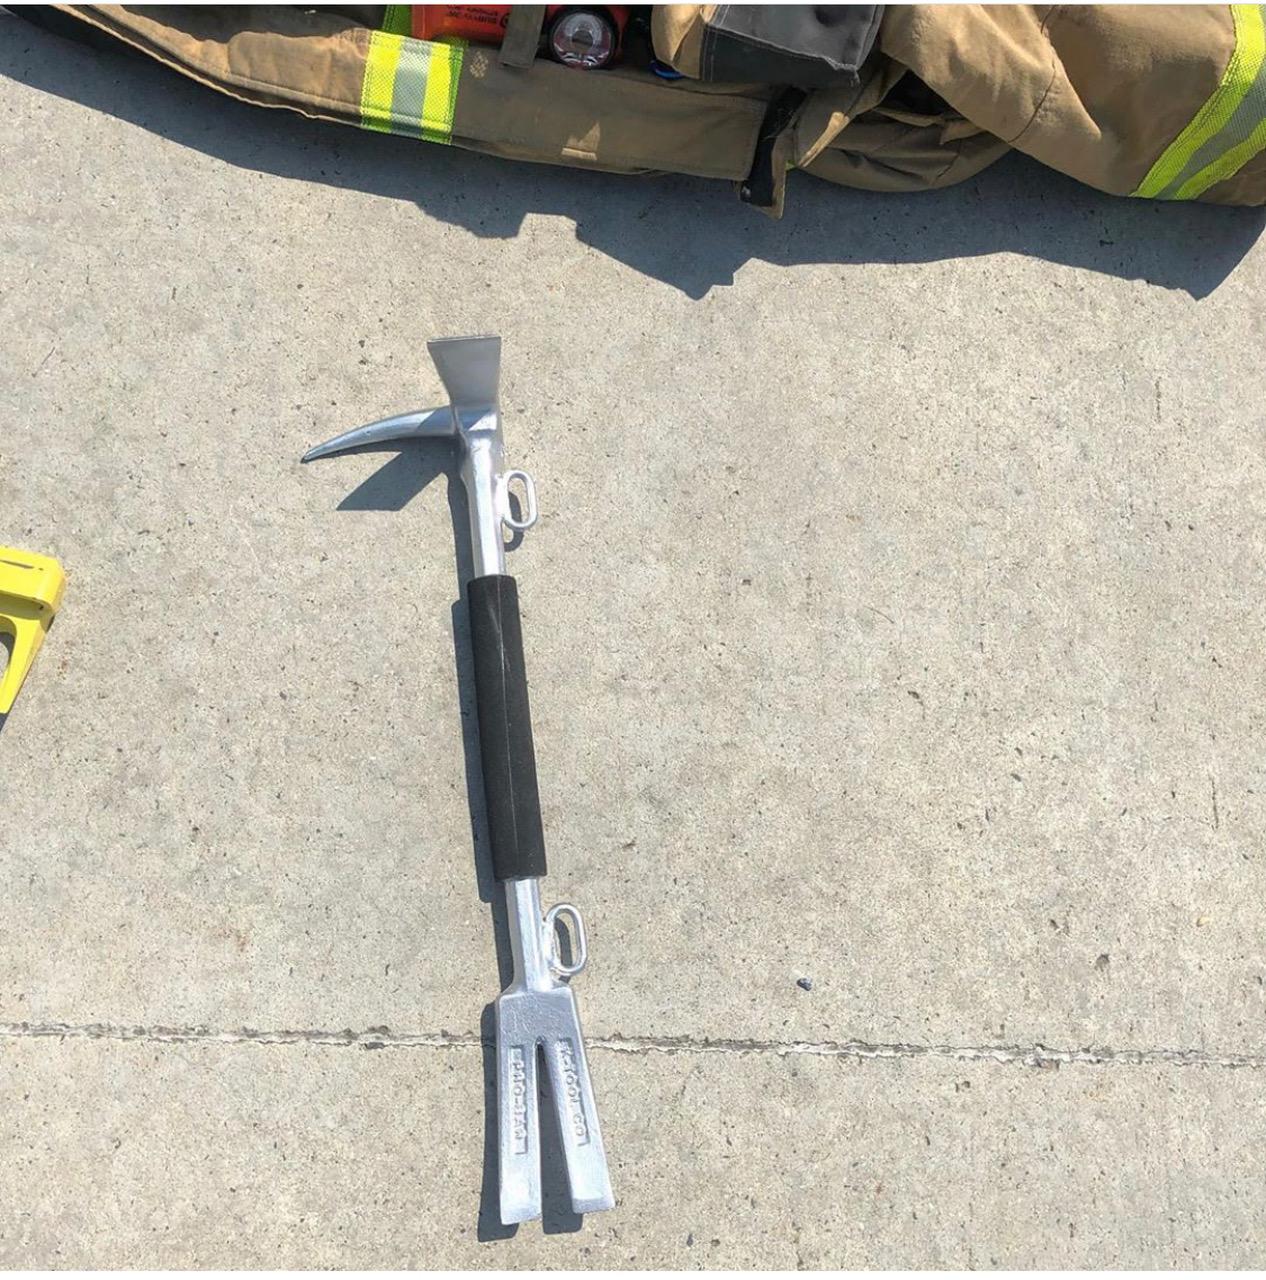 firefighter halligan probar.jpg